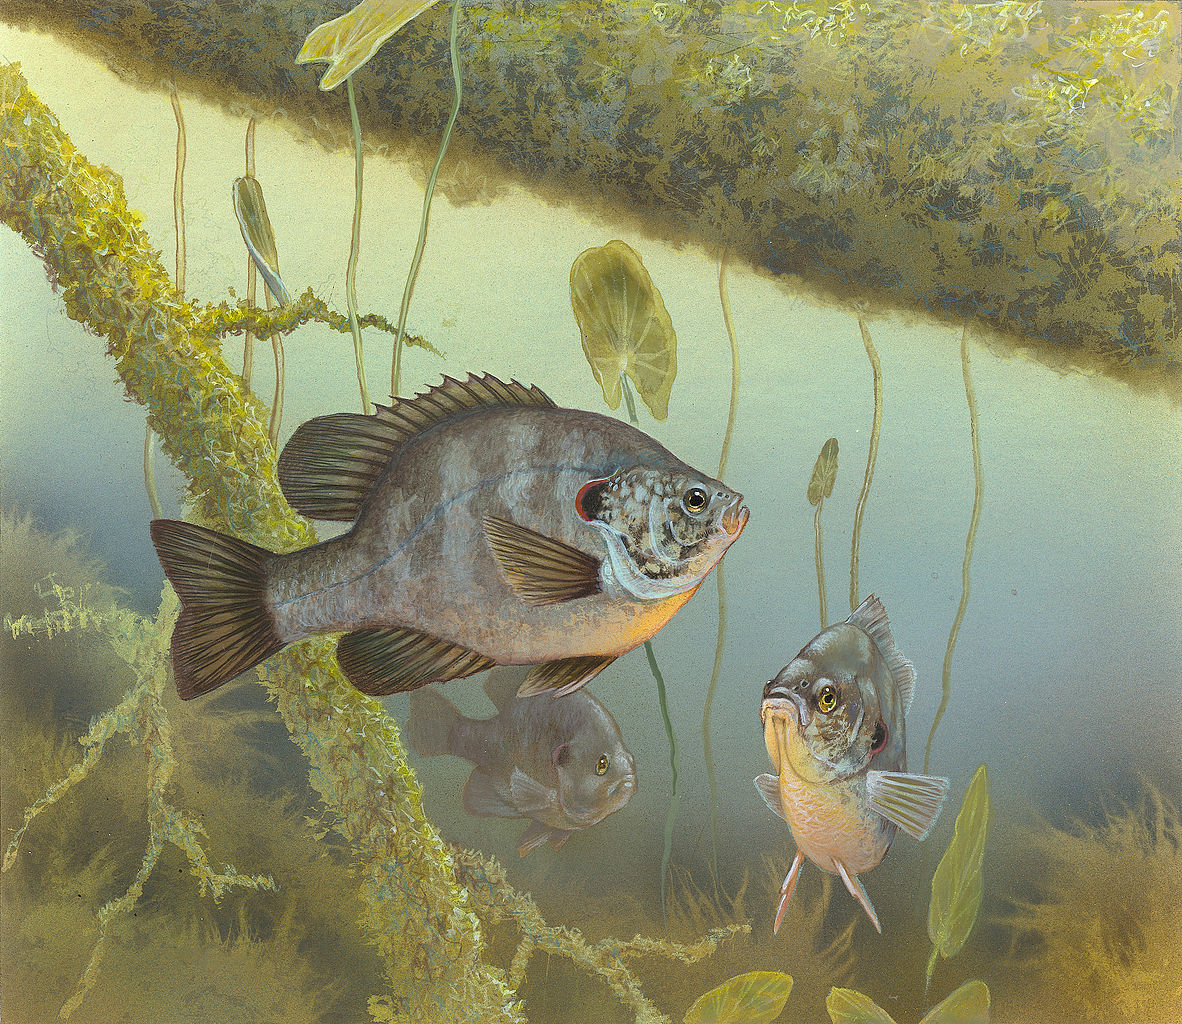 File:Redear sunfish FWS 1.jpg - Wikimedia Commons